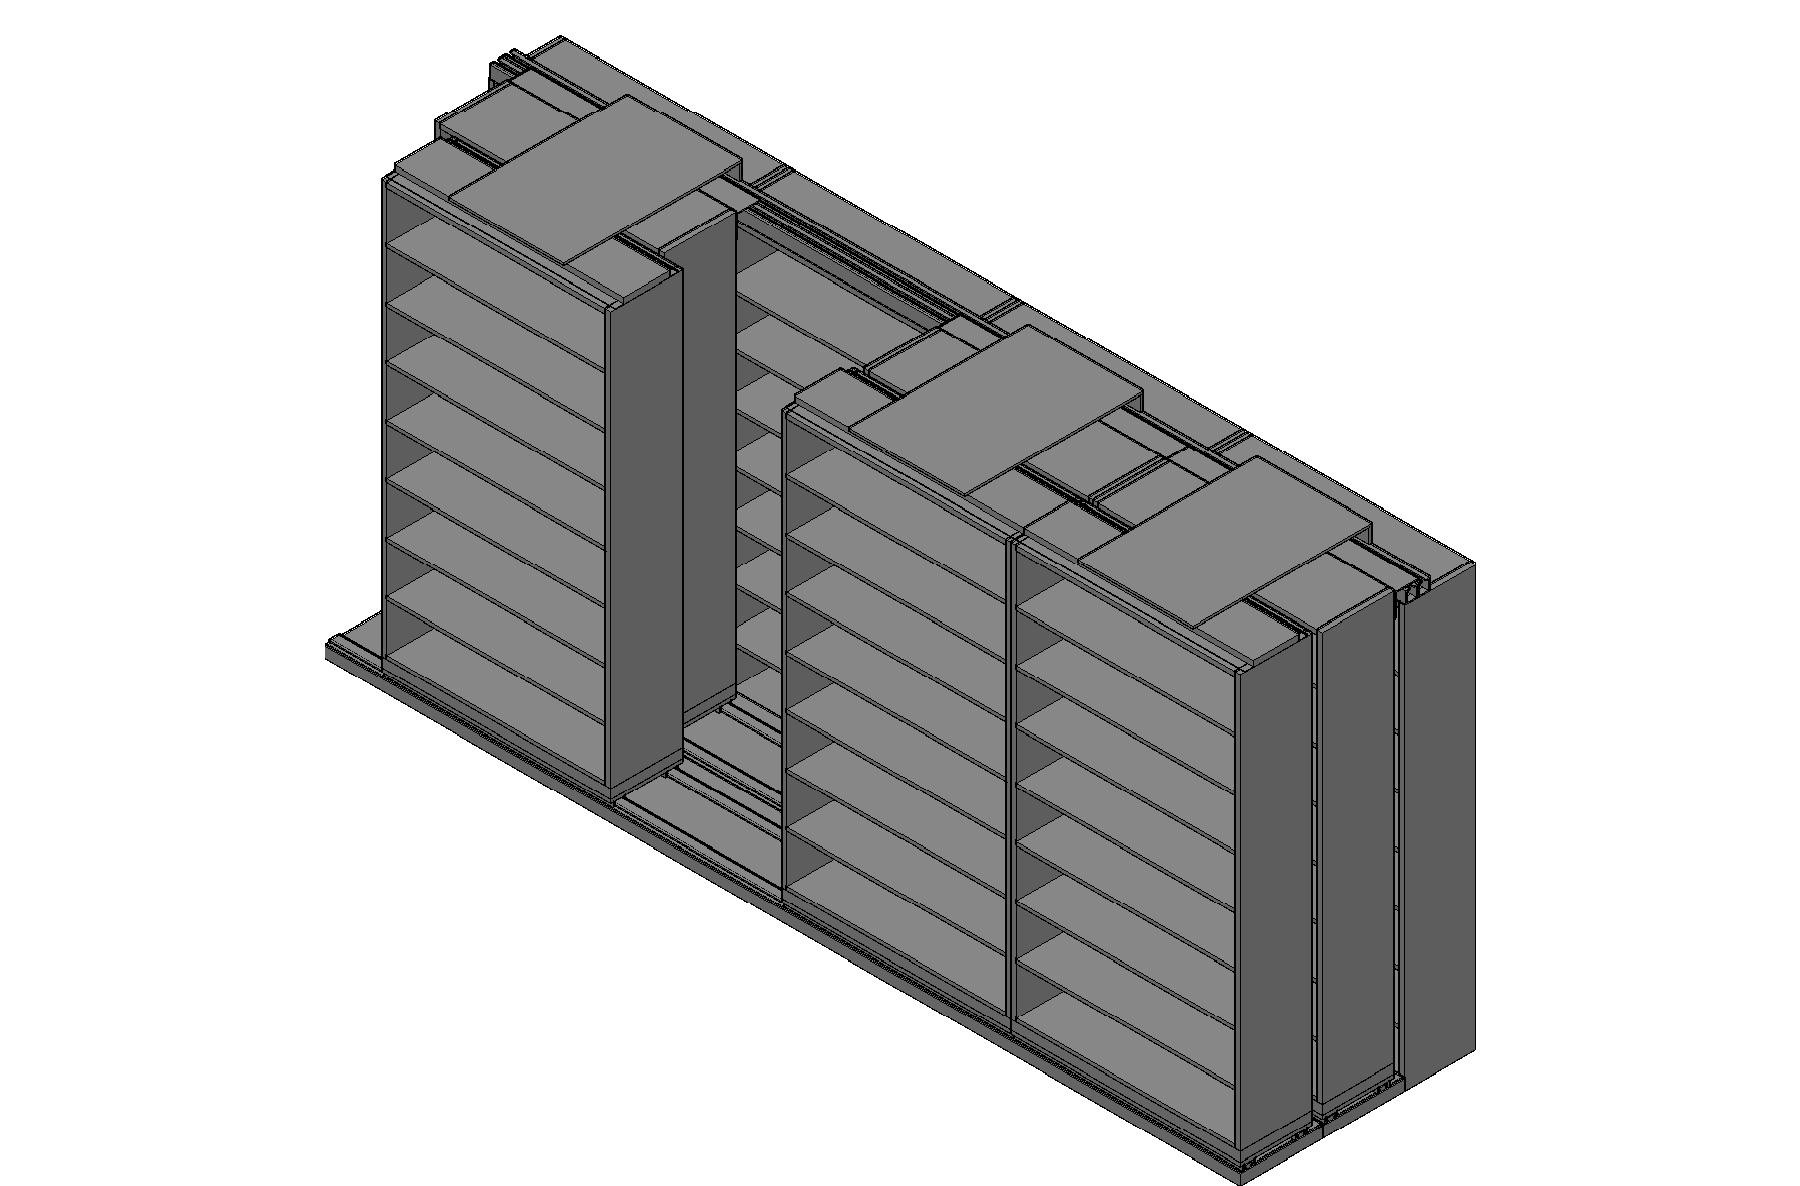 "Legal Size Sliding Shelves - 3 Rows Deep - 8 Levels - (48"" x 15"" Shelves) - 196"" Total Width"